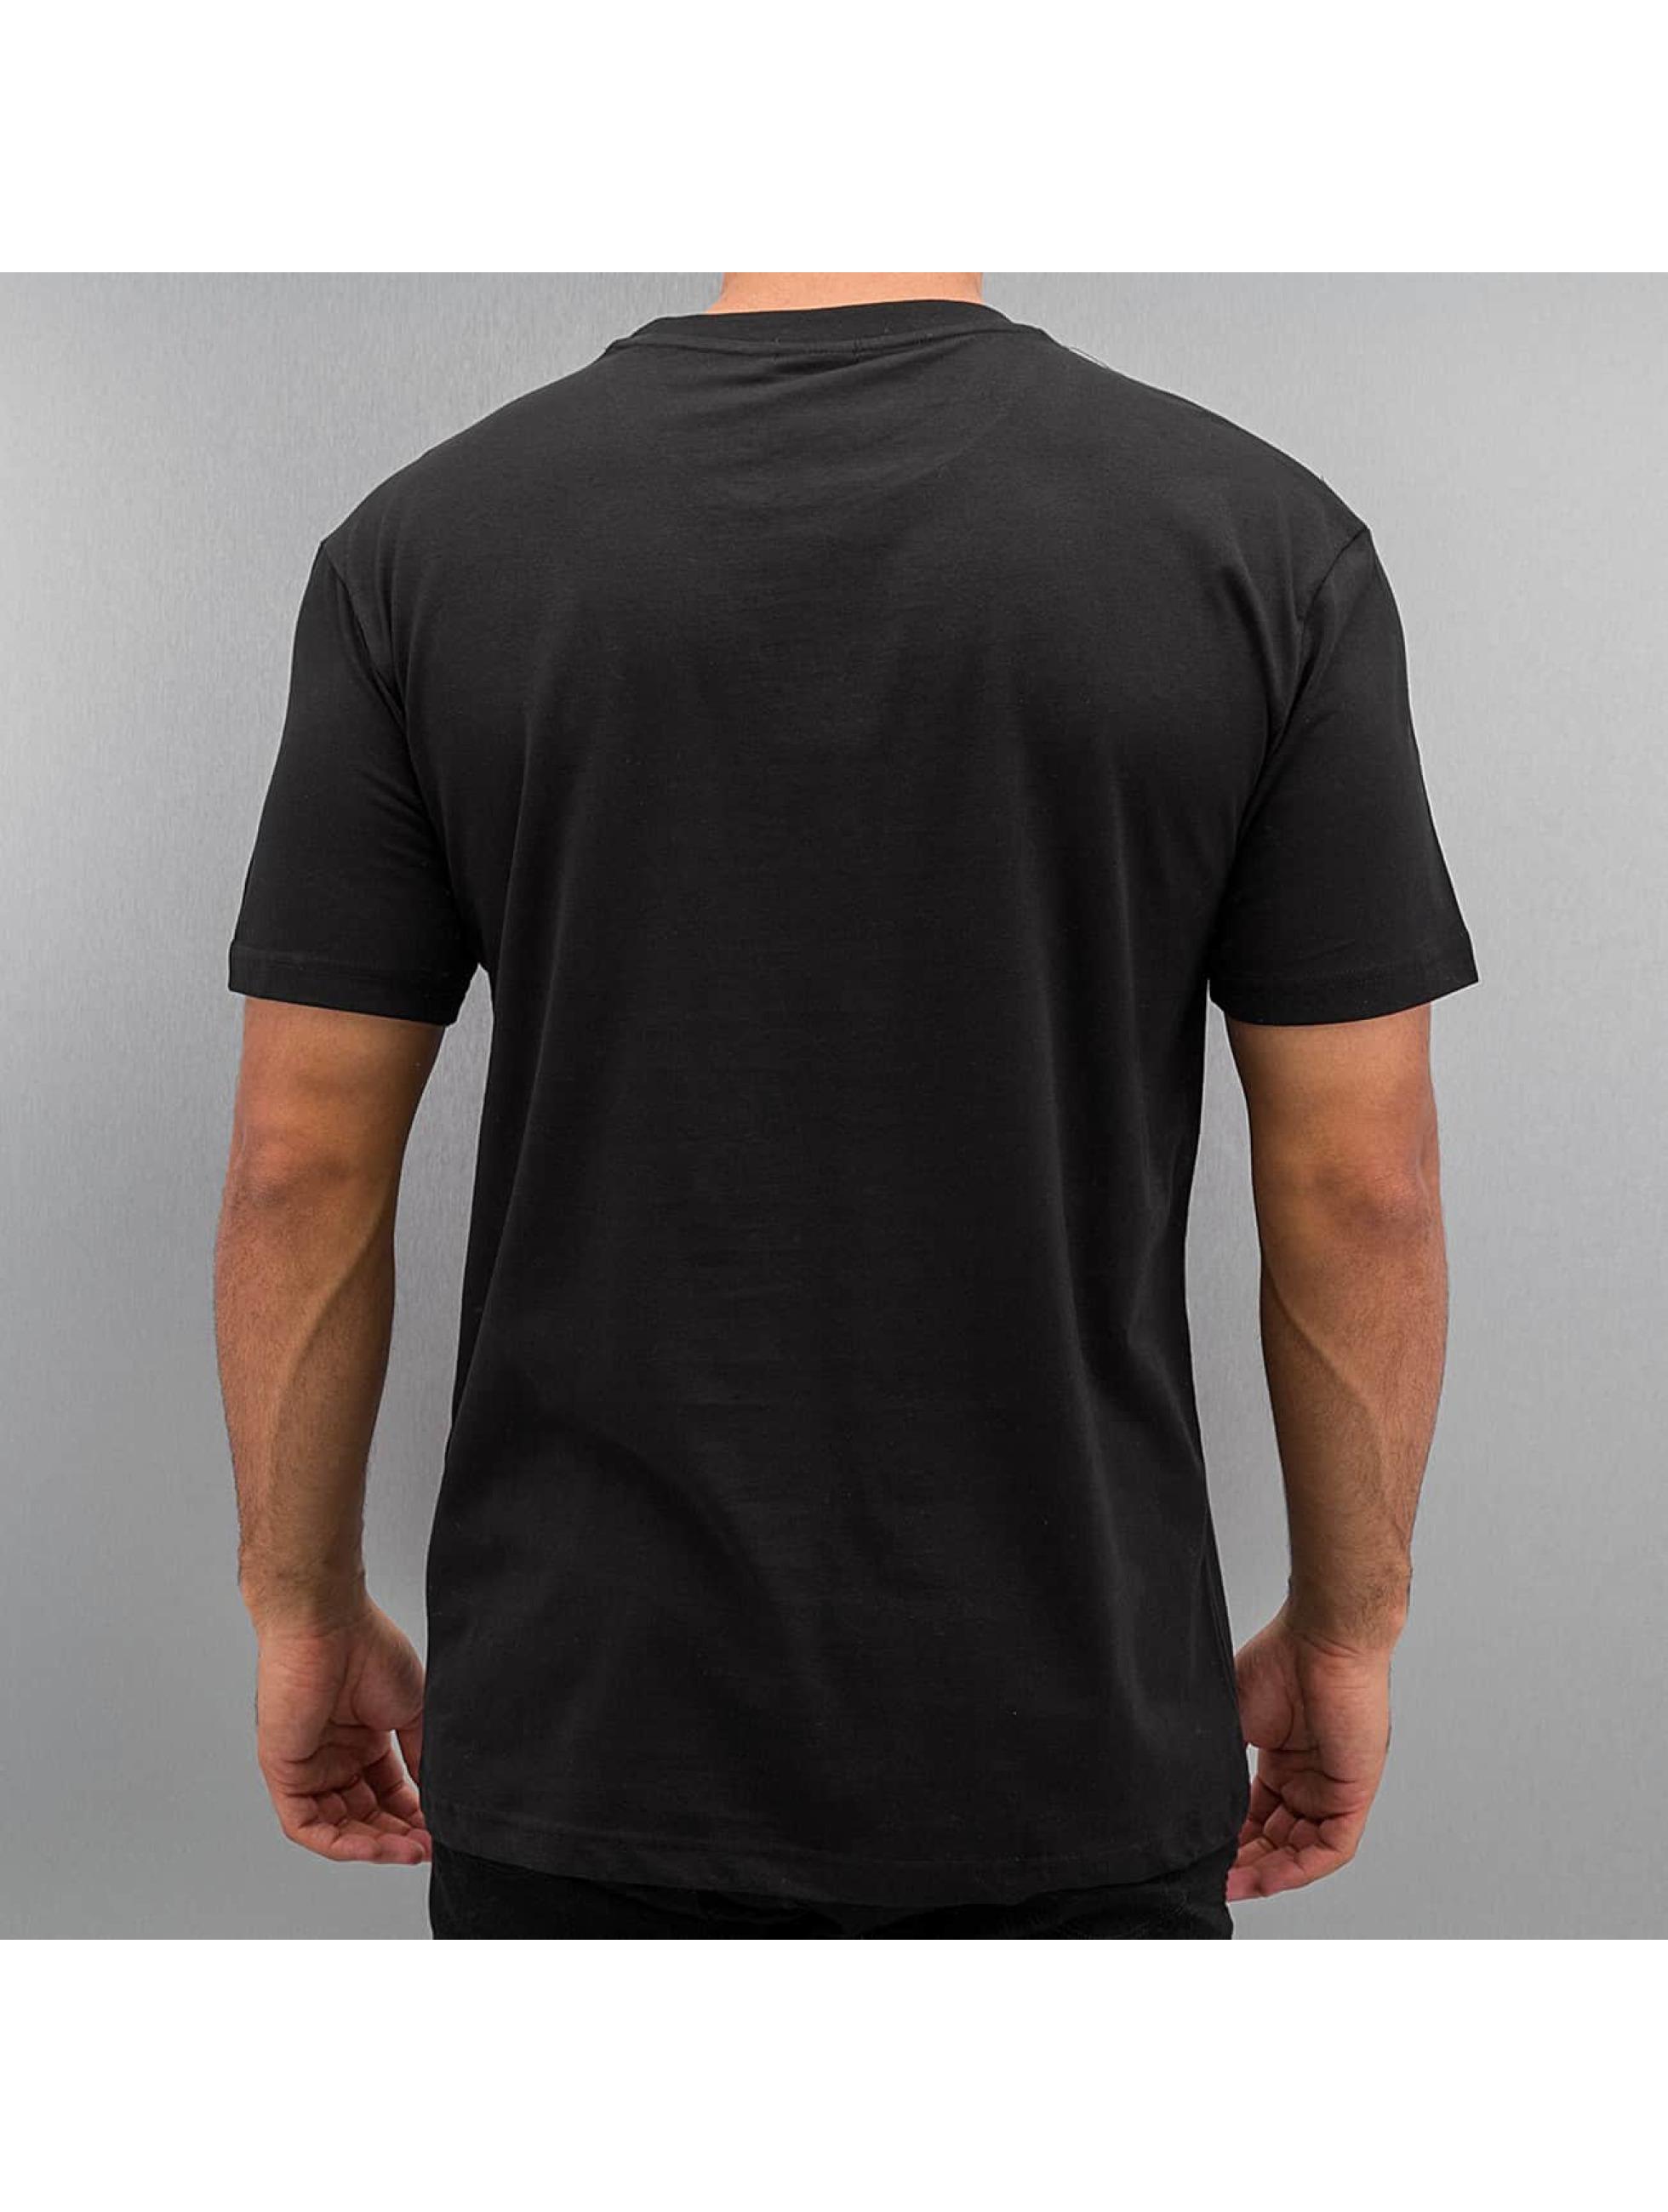 Amplified T-skjorter Run DMC Its Tricky svart